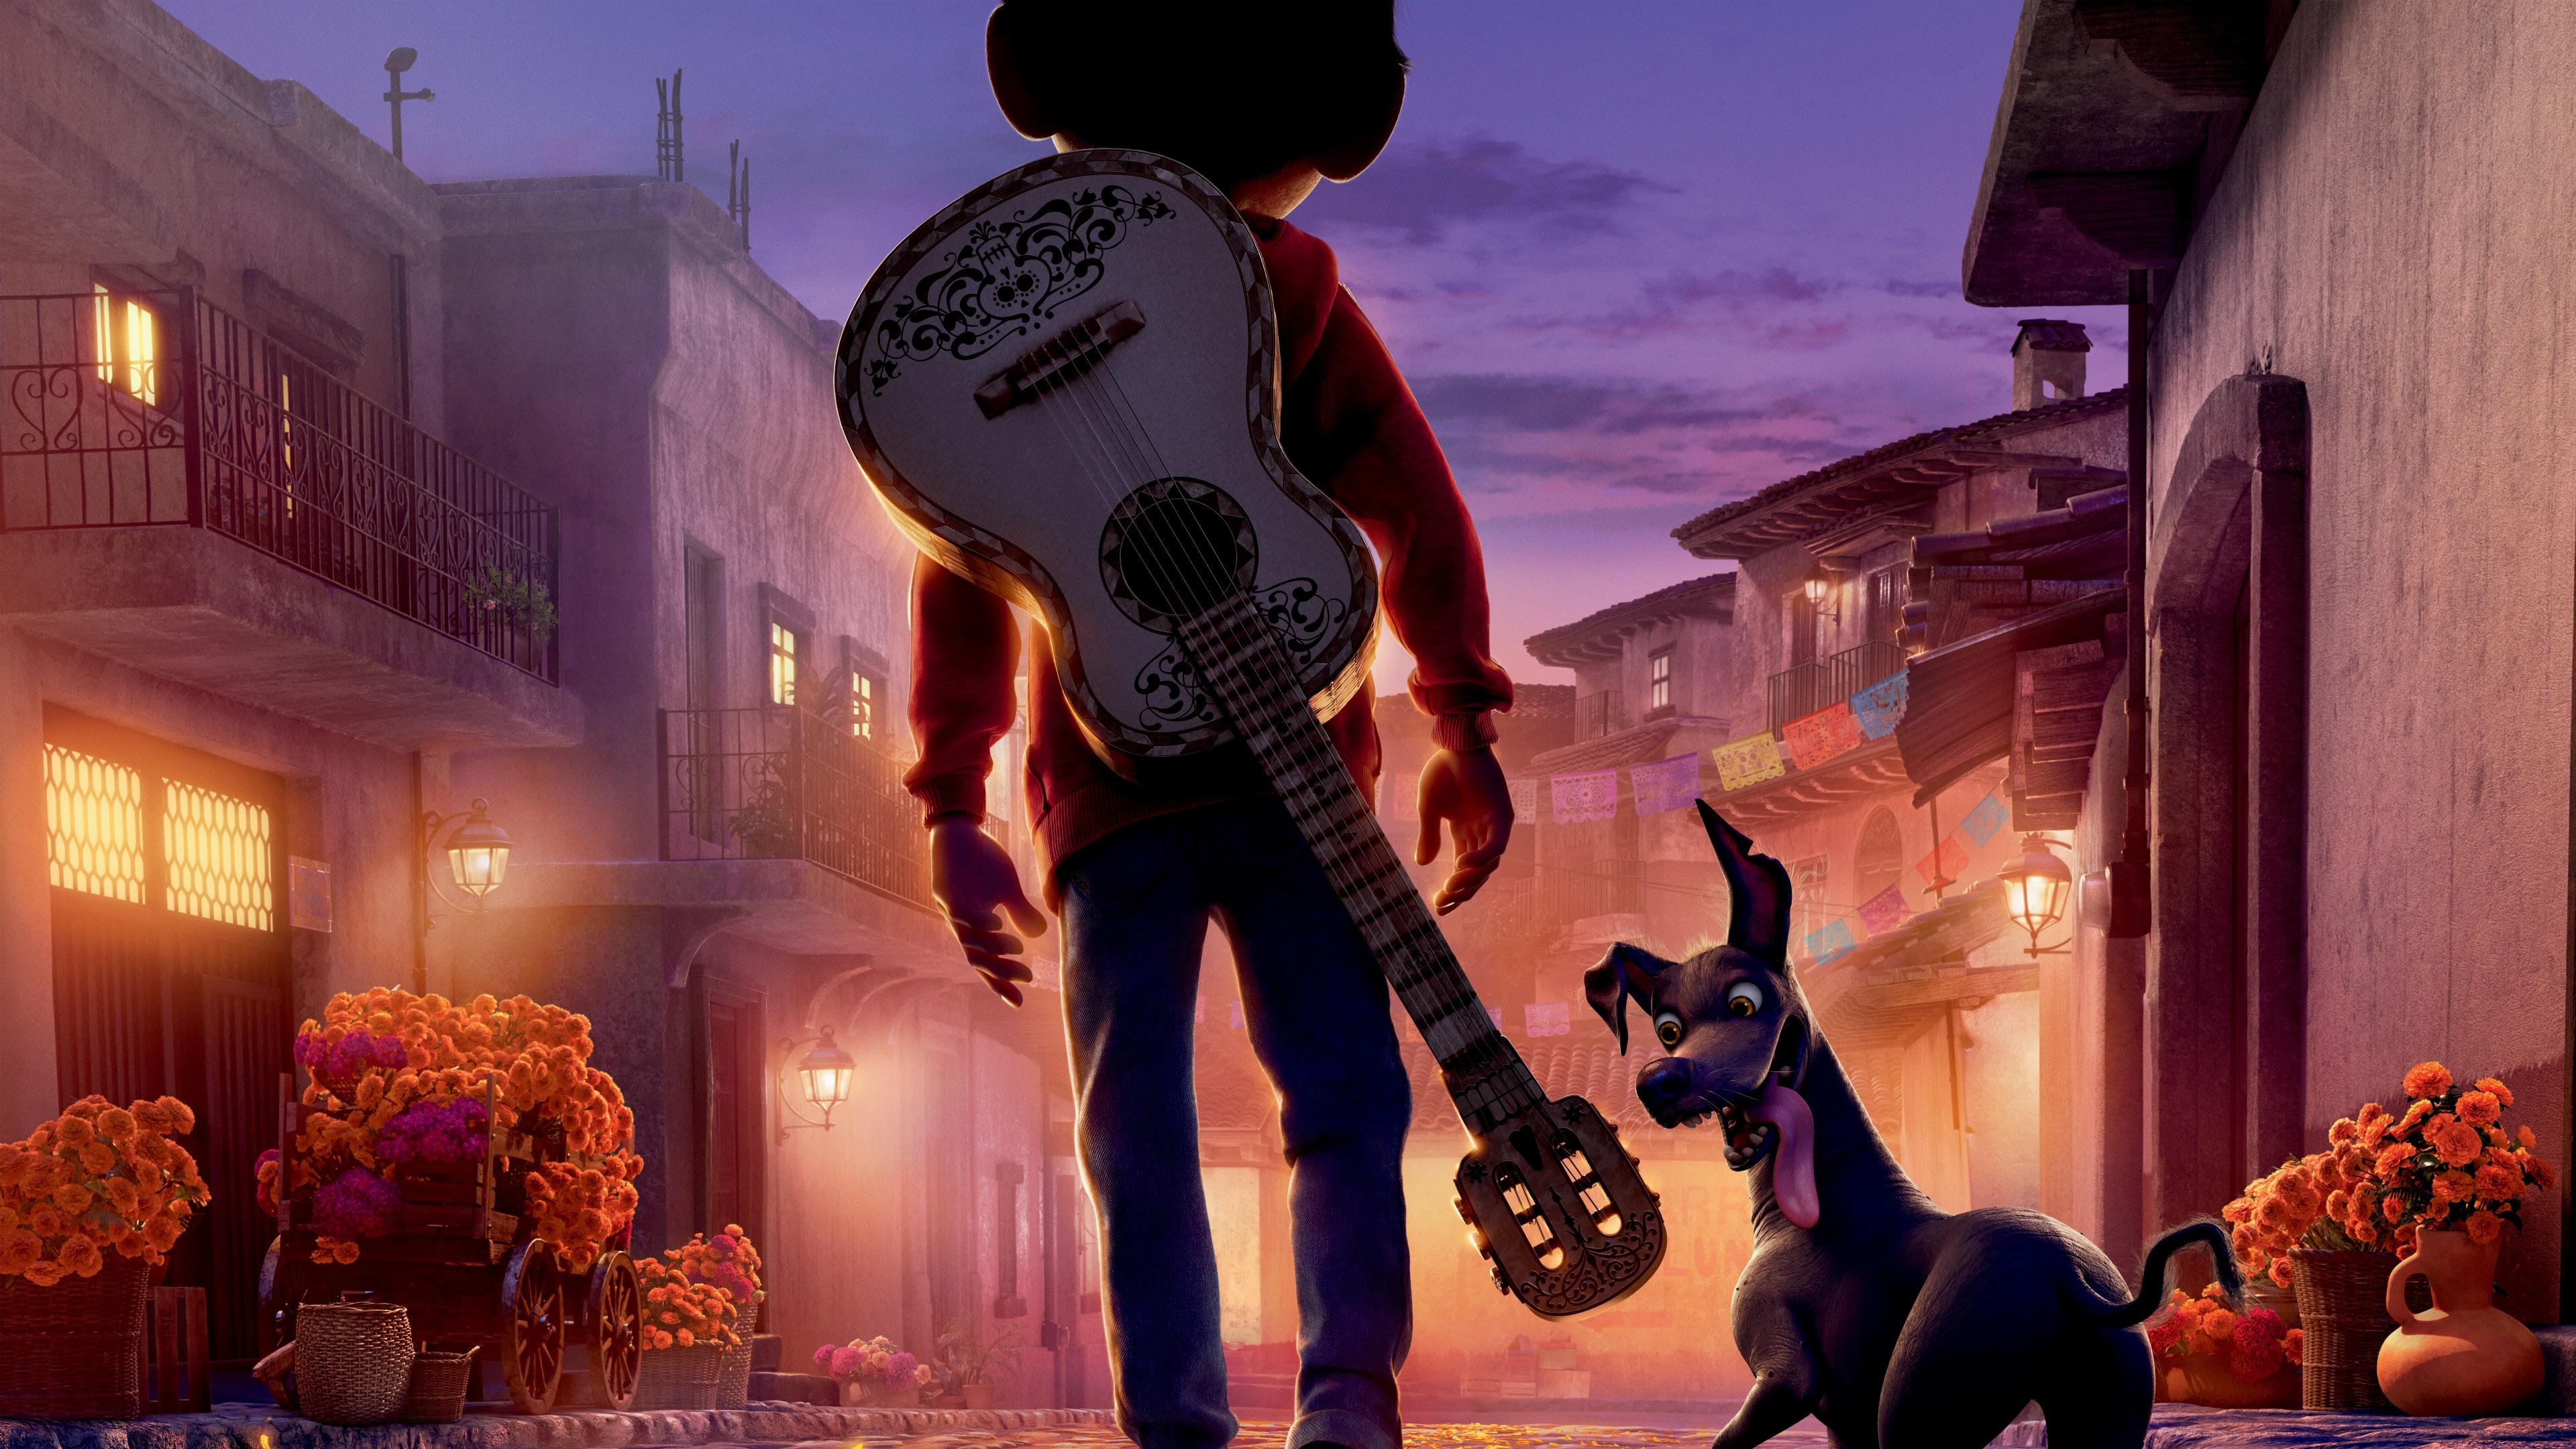 Pixar Coco 2017 4K 8K Wallpapers  HD Wallpapers  ID 20676